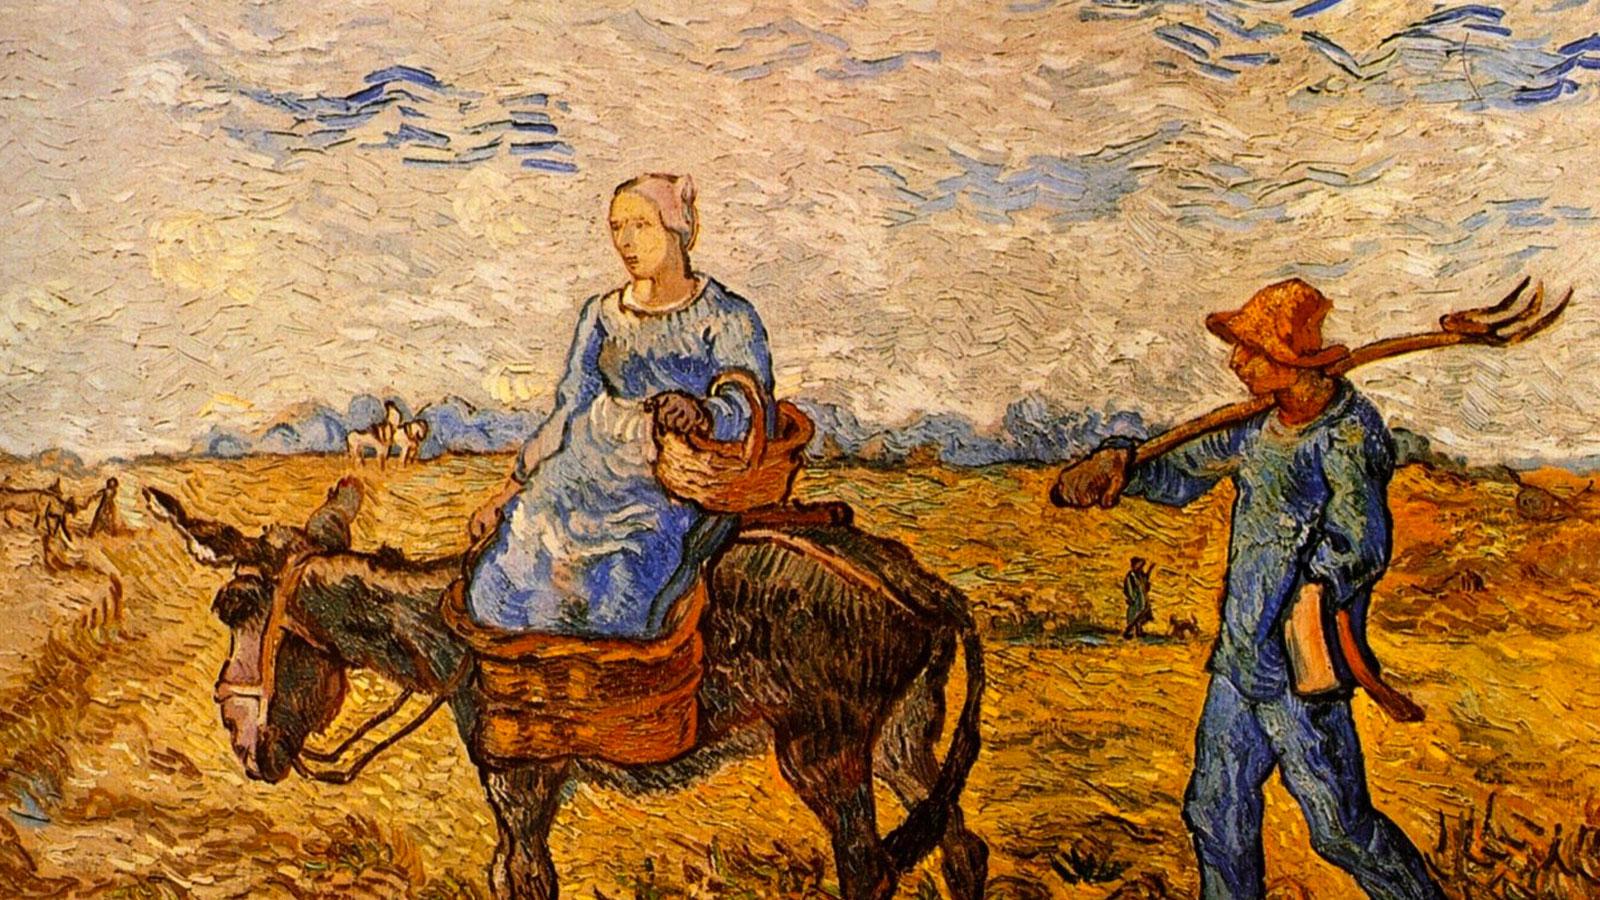 Vincent Van Gogh, Çalışmaya giden köylü çift tablosu, 1890